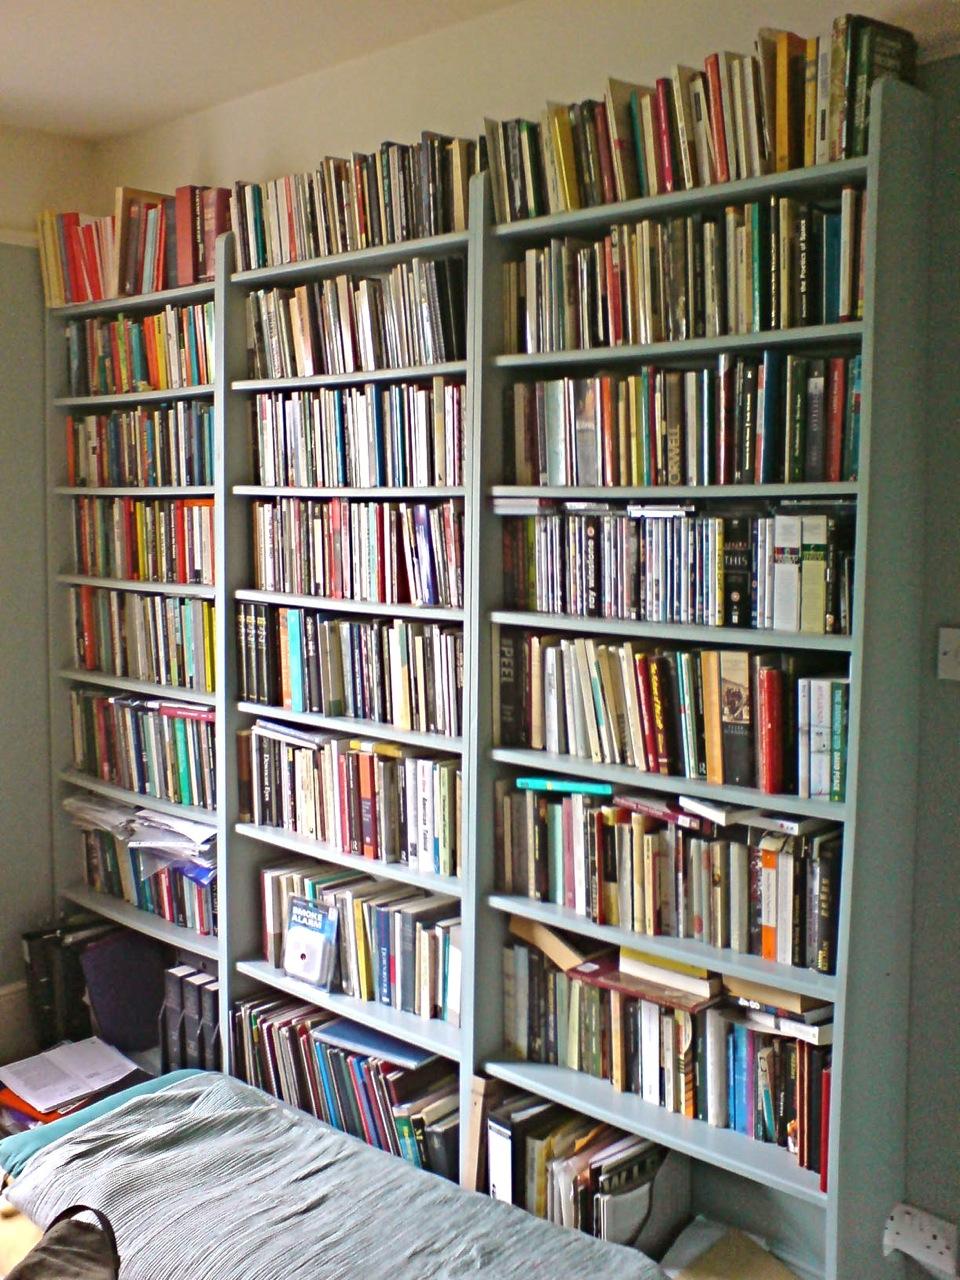 charming bibliotheque pour livres de poche 14 orkhon secondary school. Black Bedroom Furniture Sets. Home Design Ideas